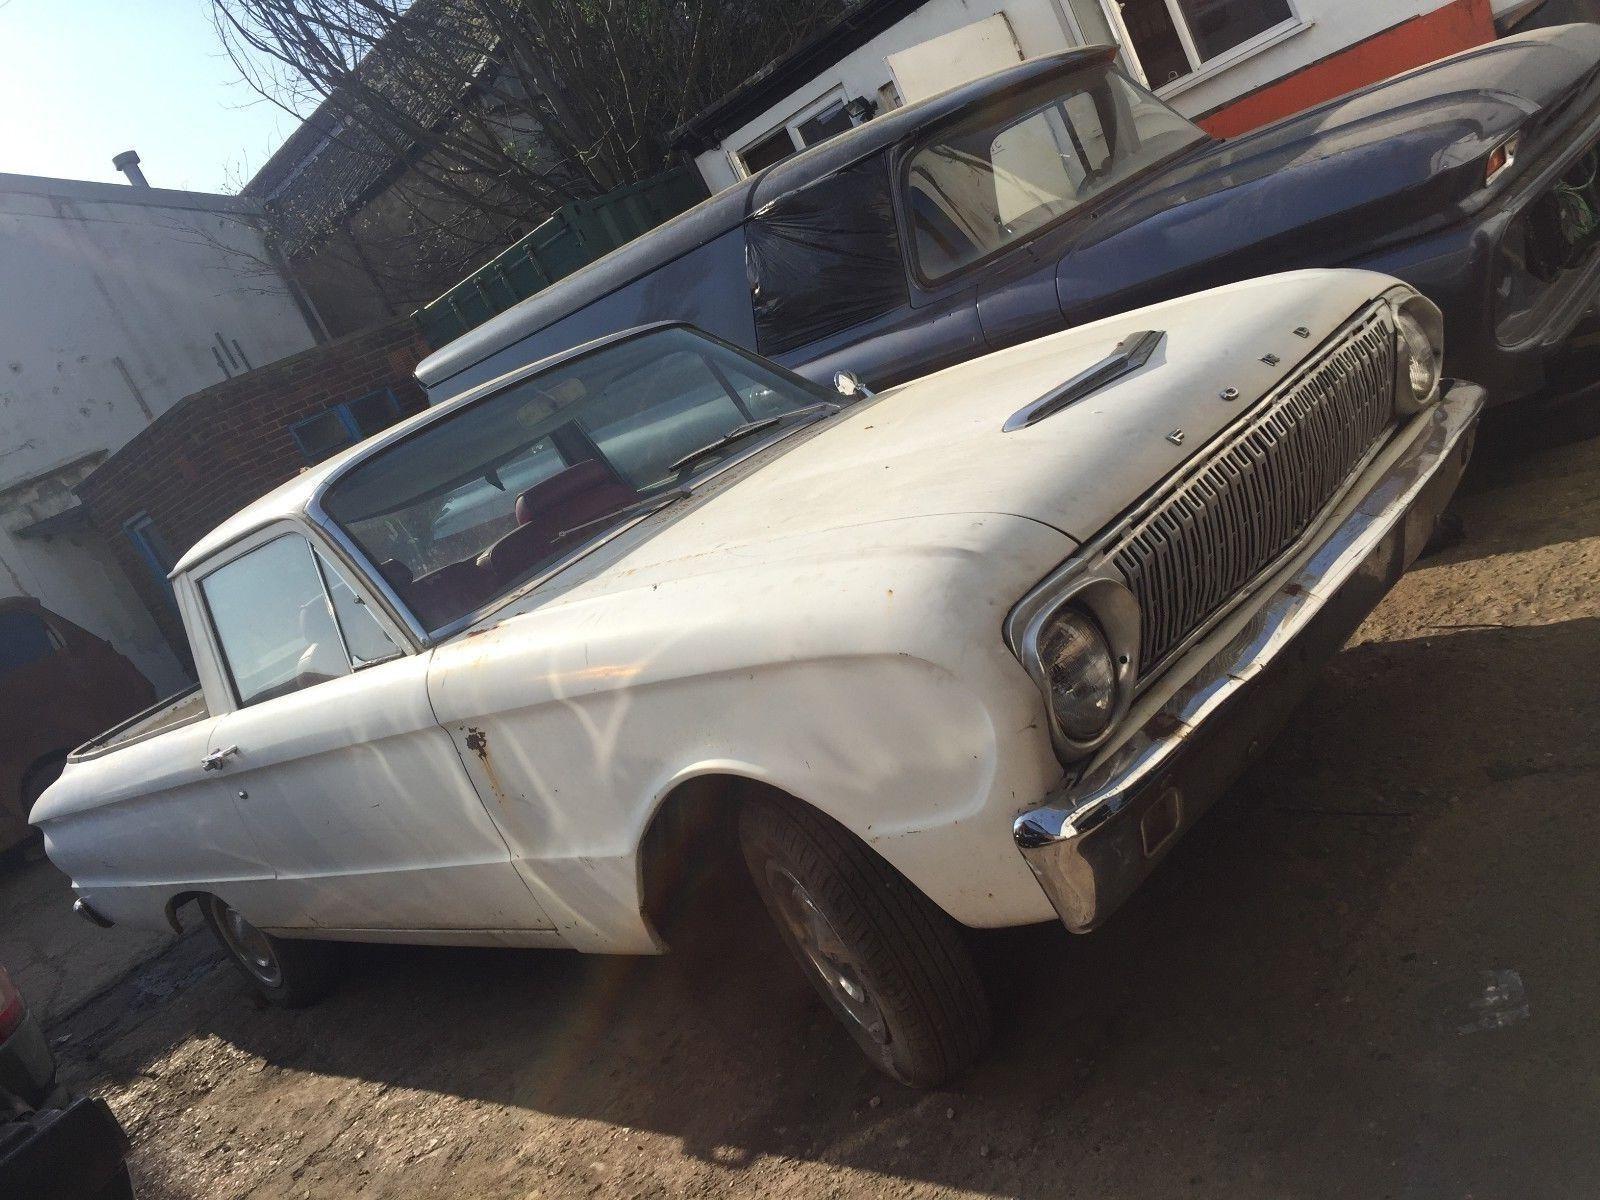 Ebay  1962 Ford Falcon Ranchero  Classiccars  Cars